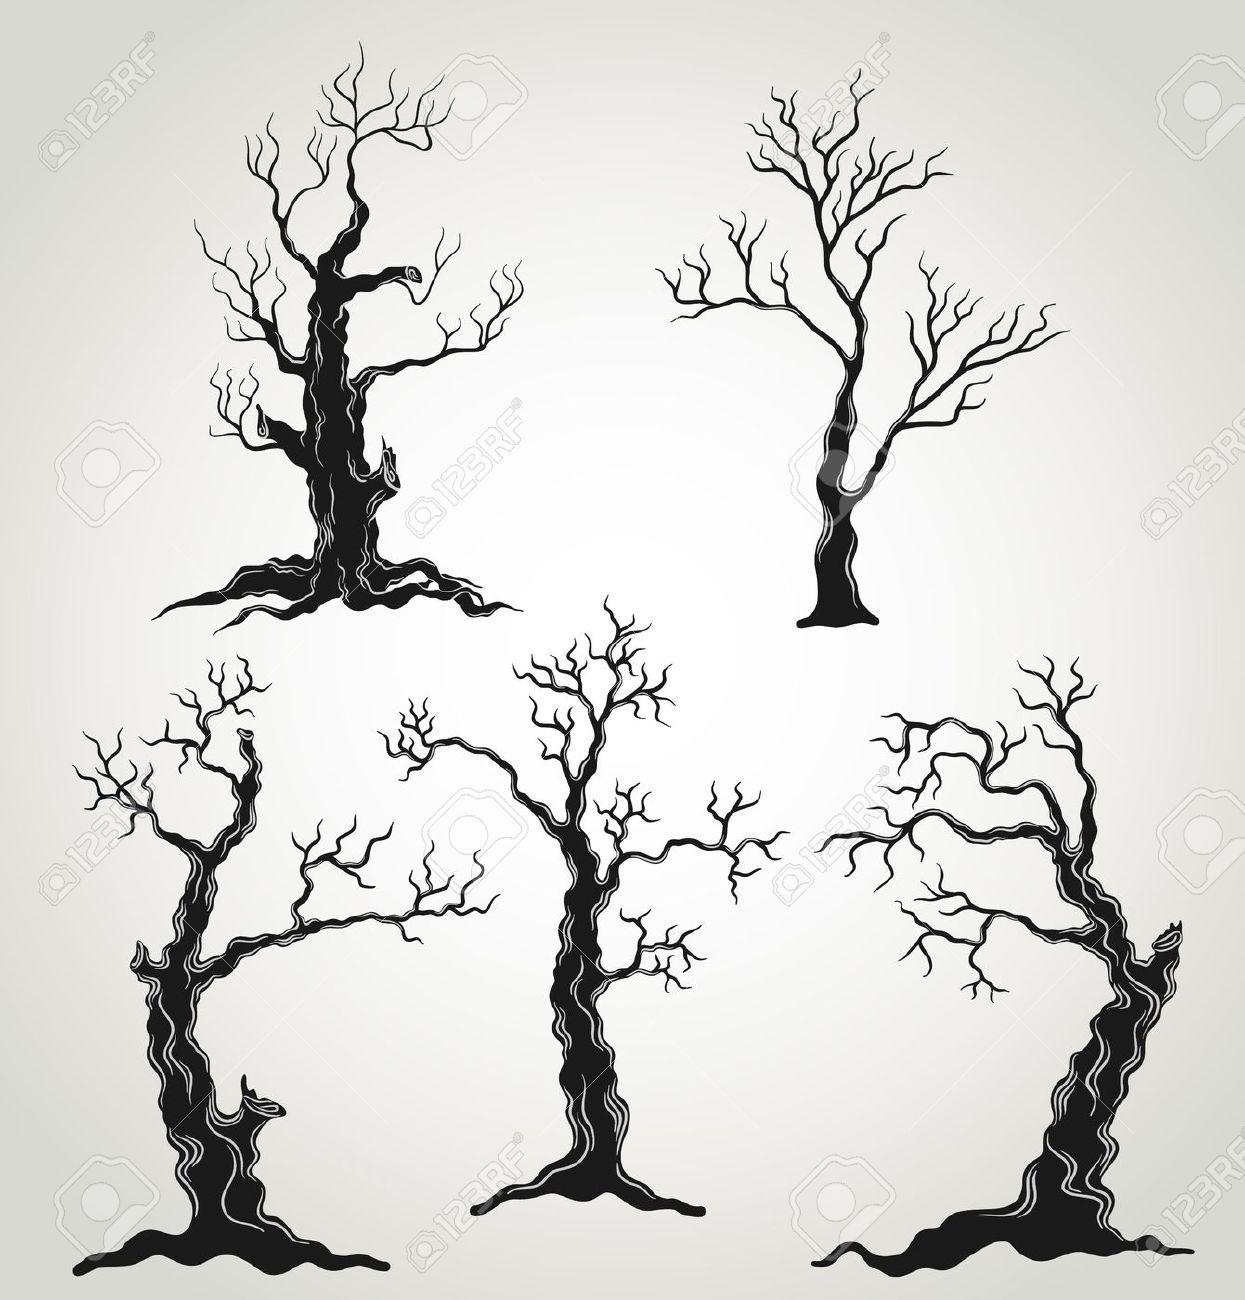 1245x1300 Spooky Tree Stock Vector Illustration And Royalty Free Spooky Tree